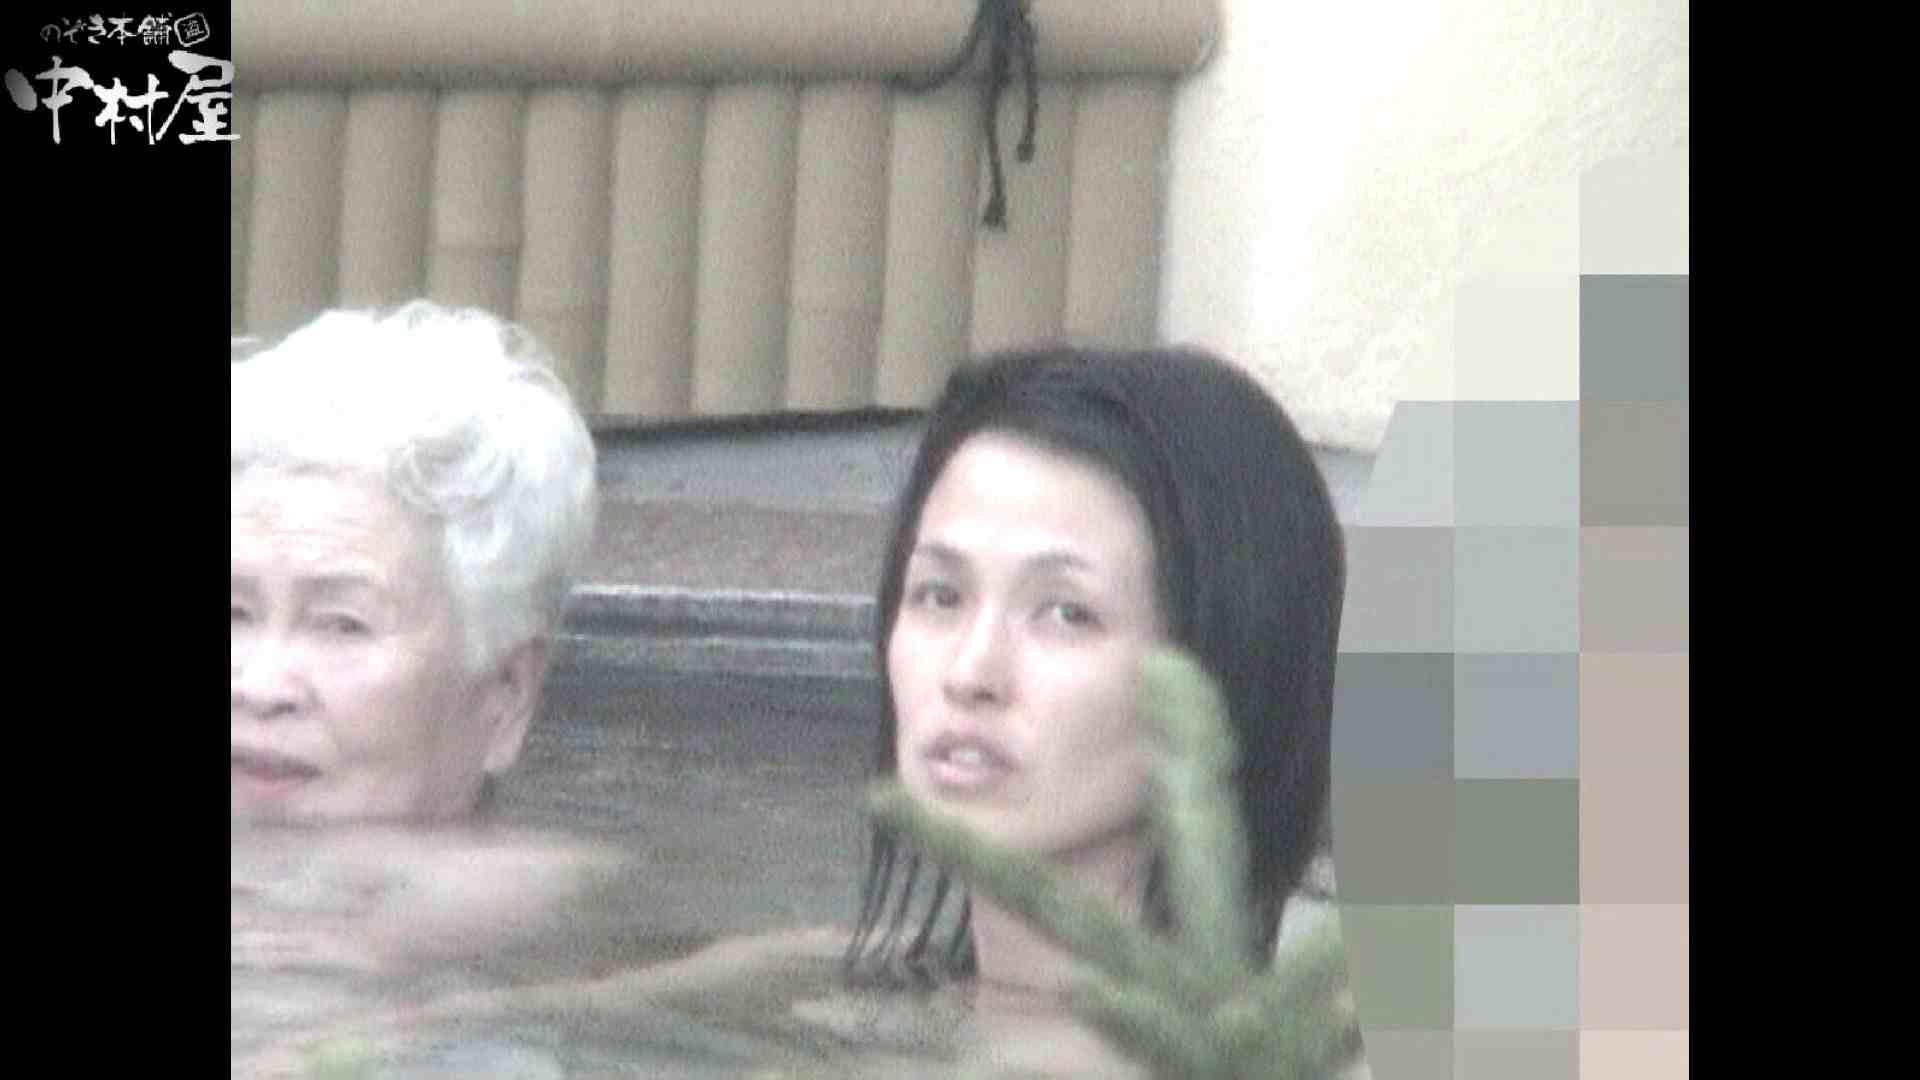 Aquaな露天風呂Vol.933 盗撮 おまんこ動画流出 78PICs 65